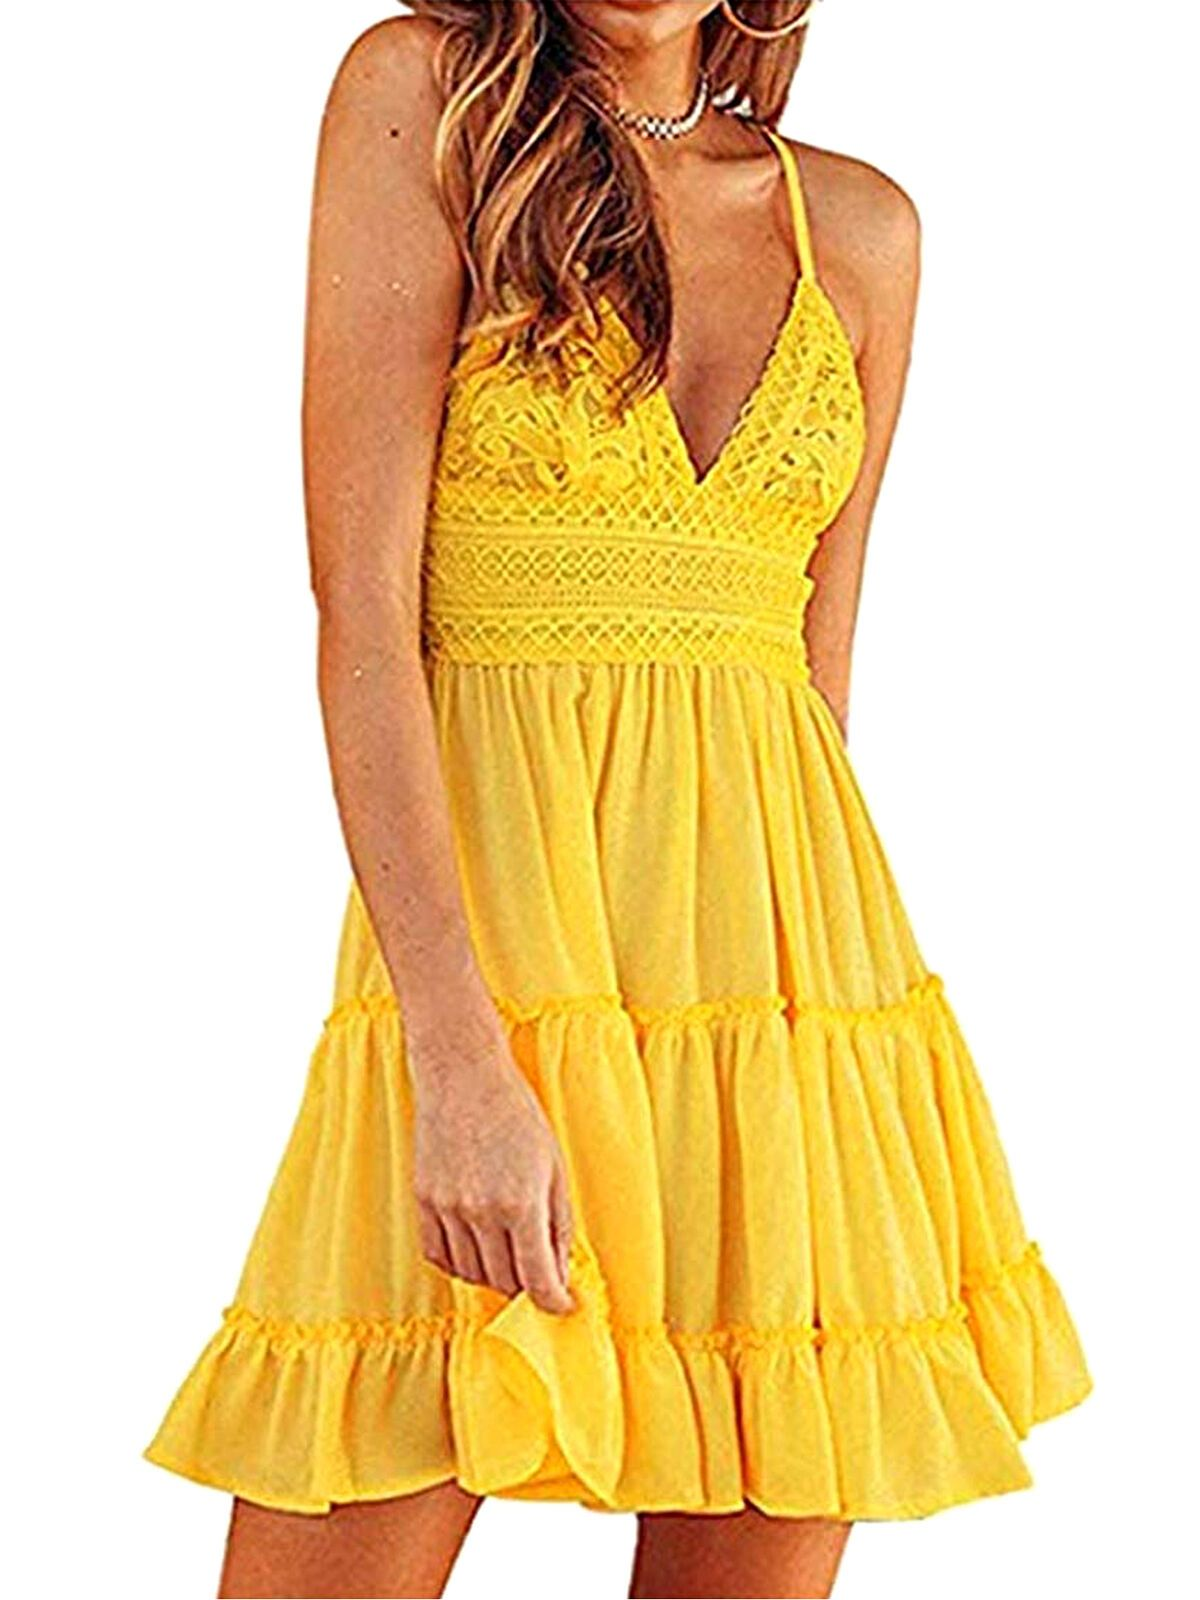 Tetyseysh Tetyseysh Womens Boho Maxi Dress Lady Evening Cocktail Party Beach Sundress Walmart Com In 2021 Boho Maxi Dress Swing Skater Dress Mini Skater Dress [ 1600 x 1200 Pixel ]